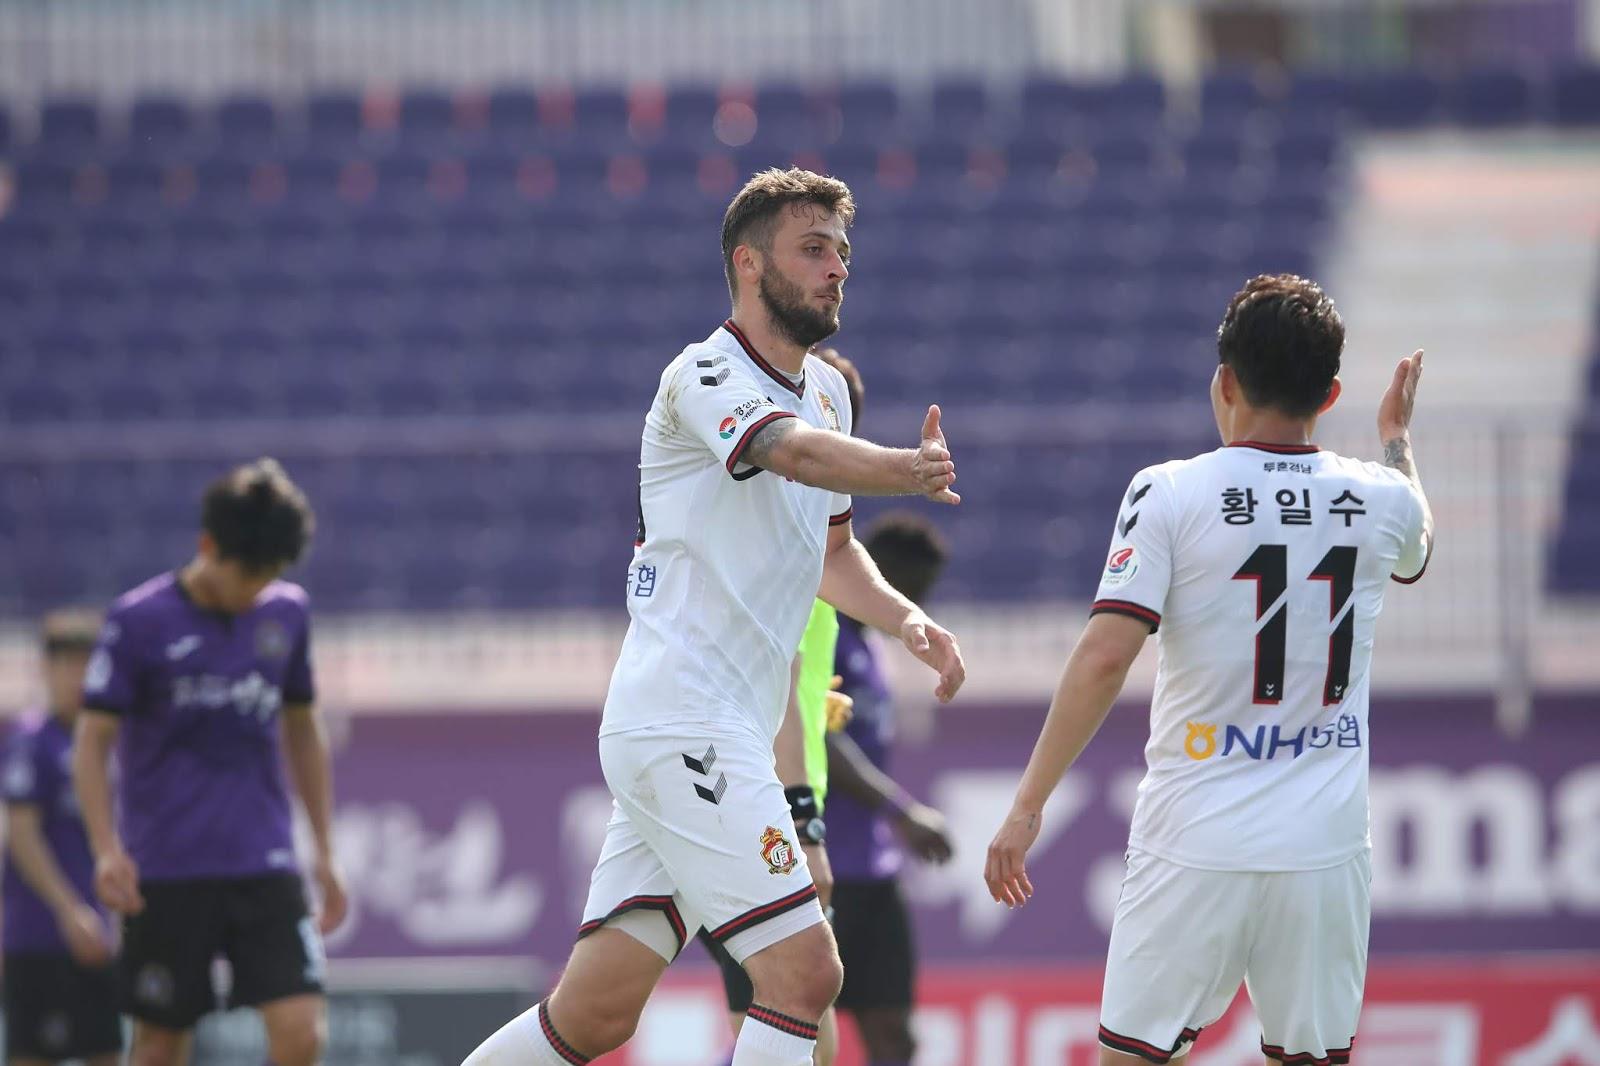 Preview-Suwon FC vs Gyeongnam FC